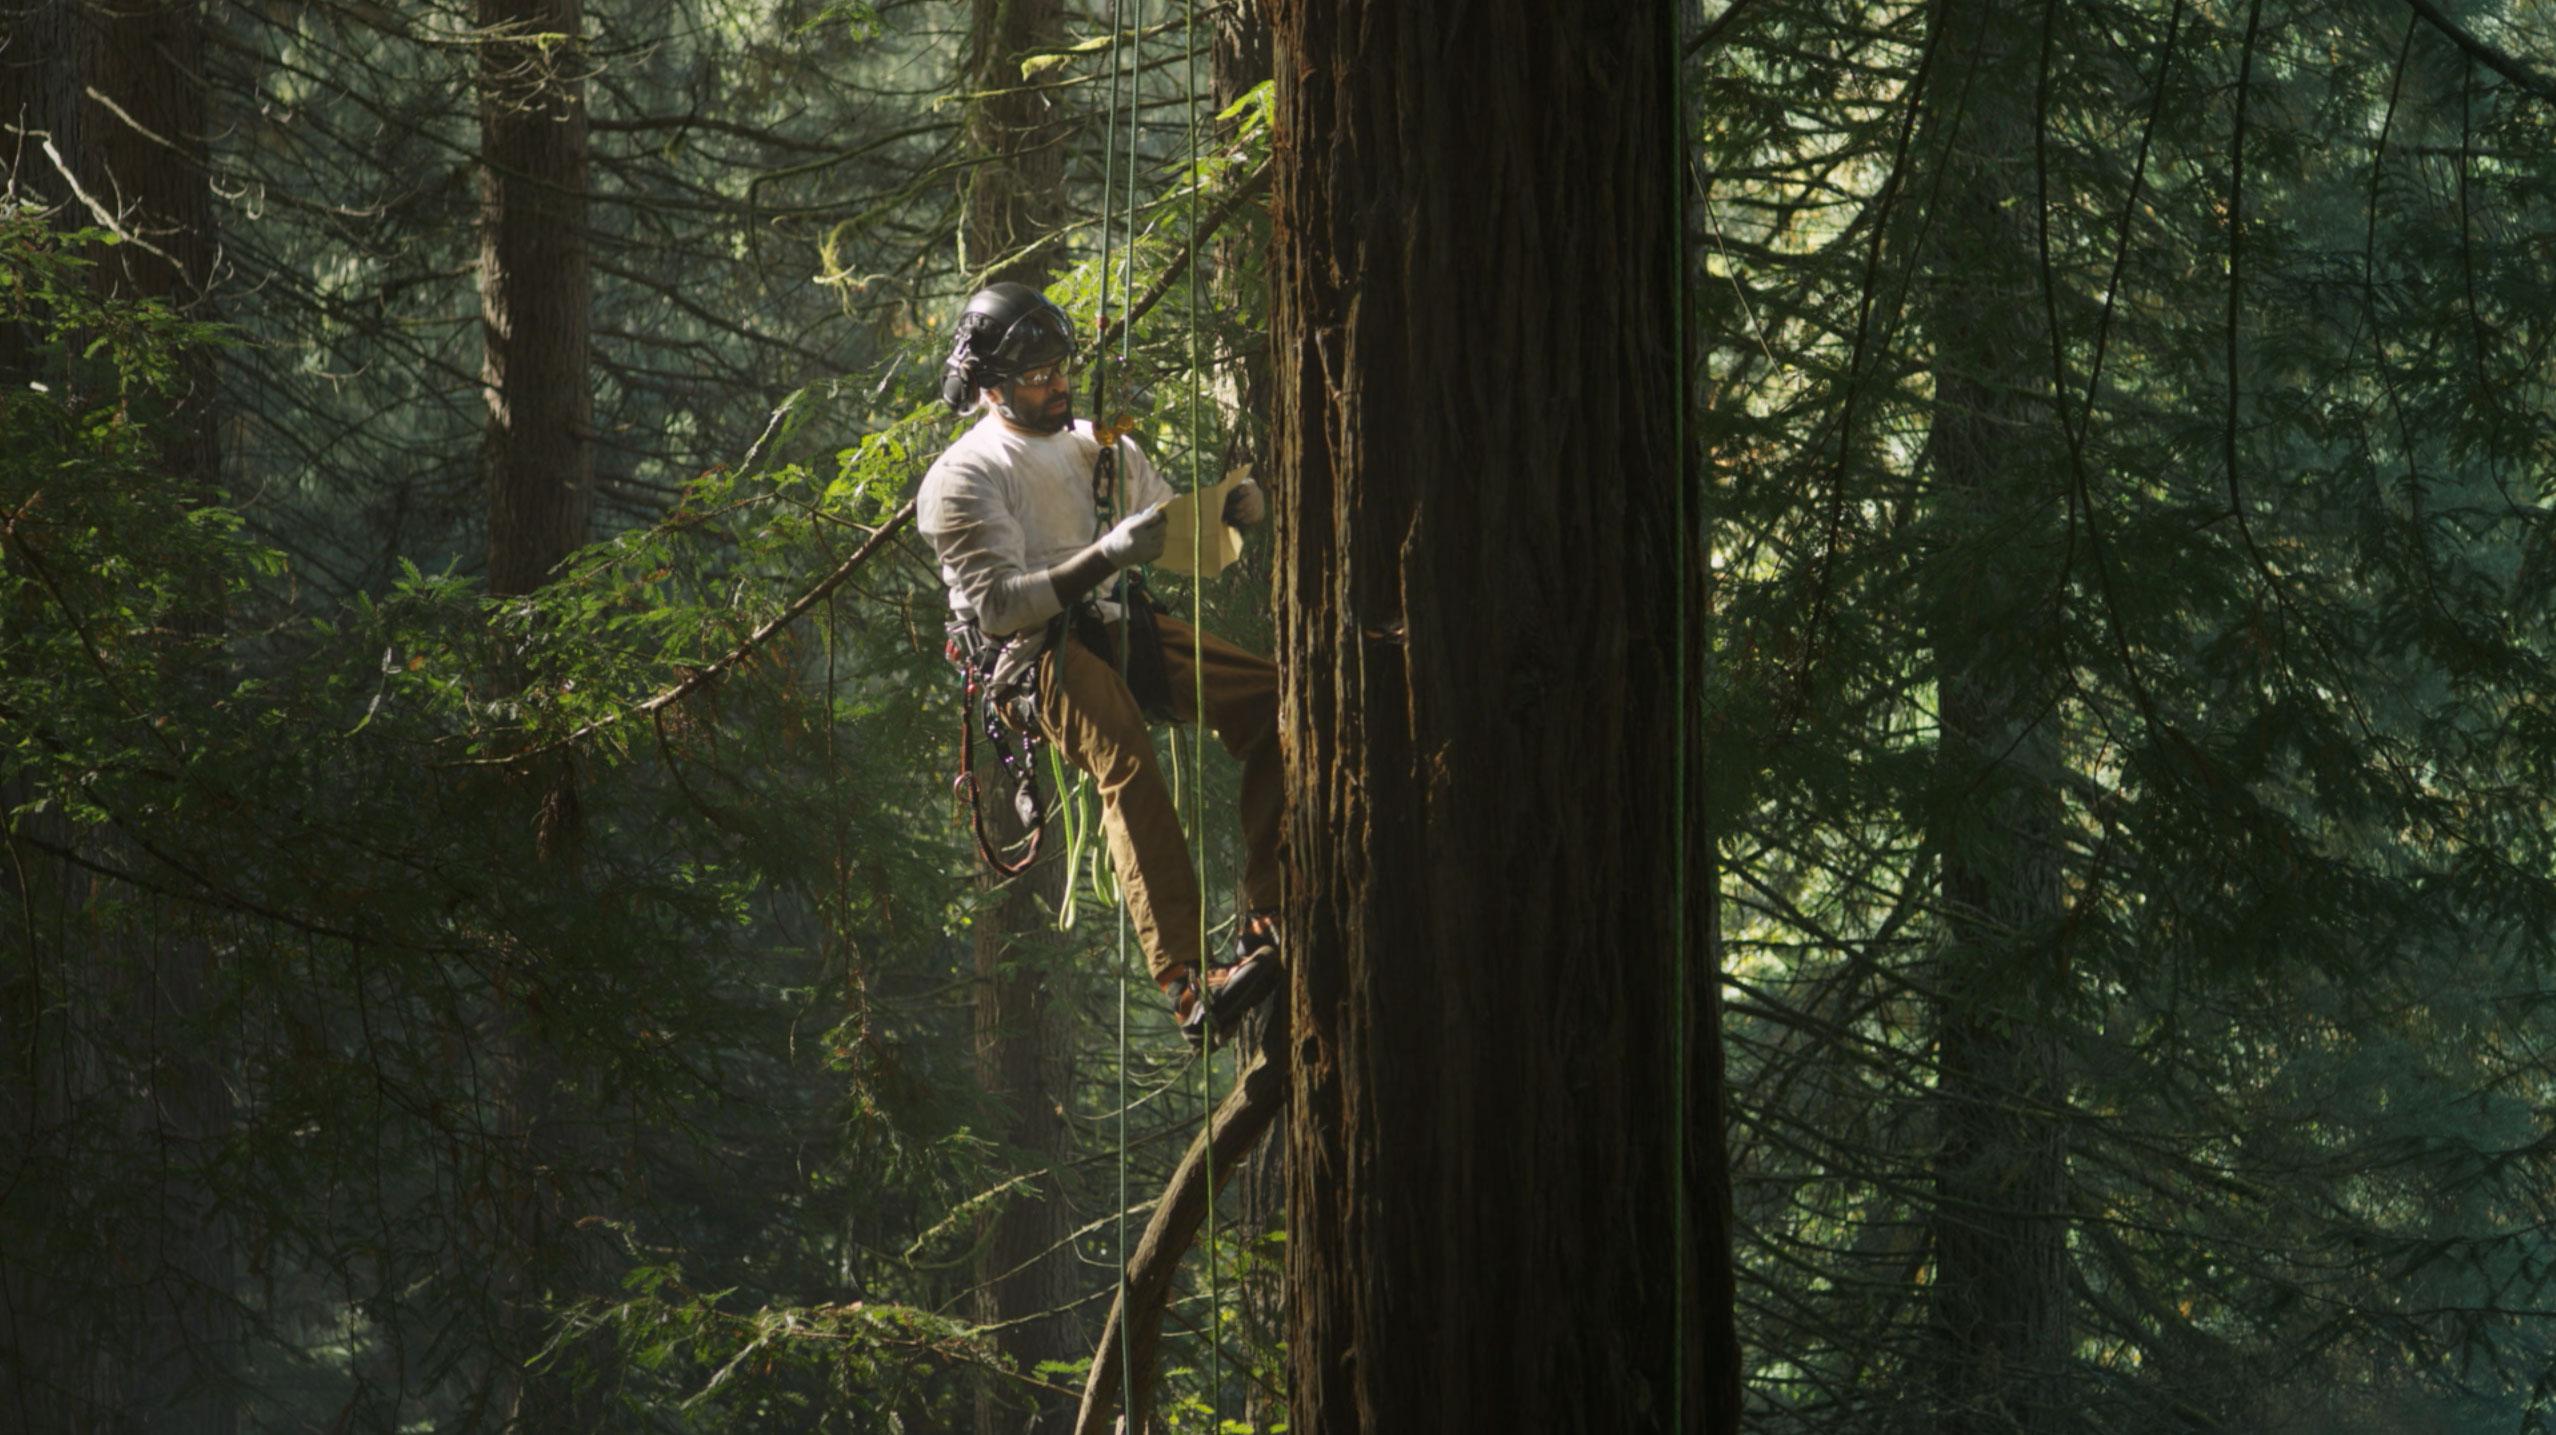 Carhartt Mentor Campaign - Arborist